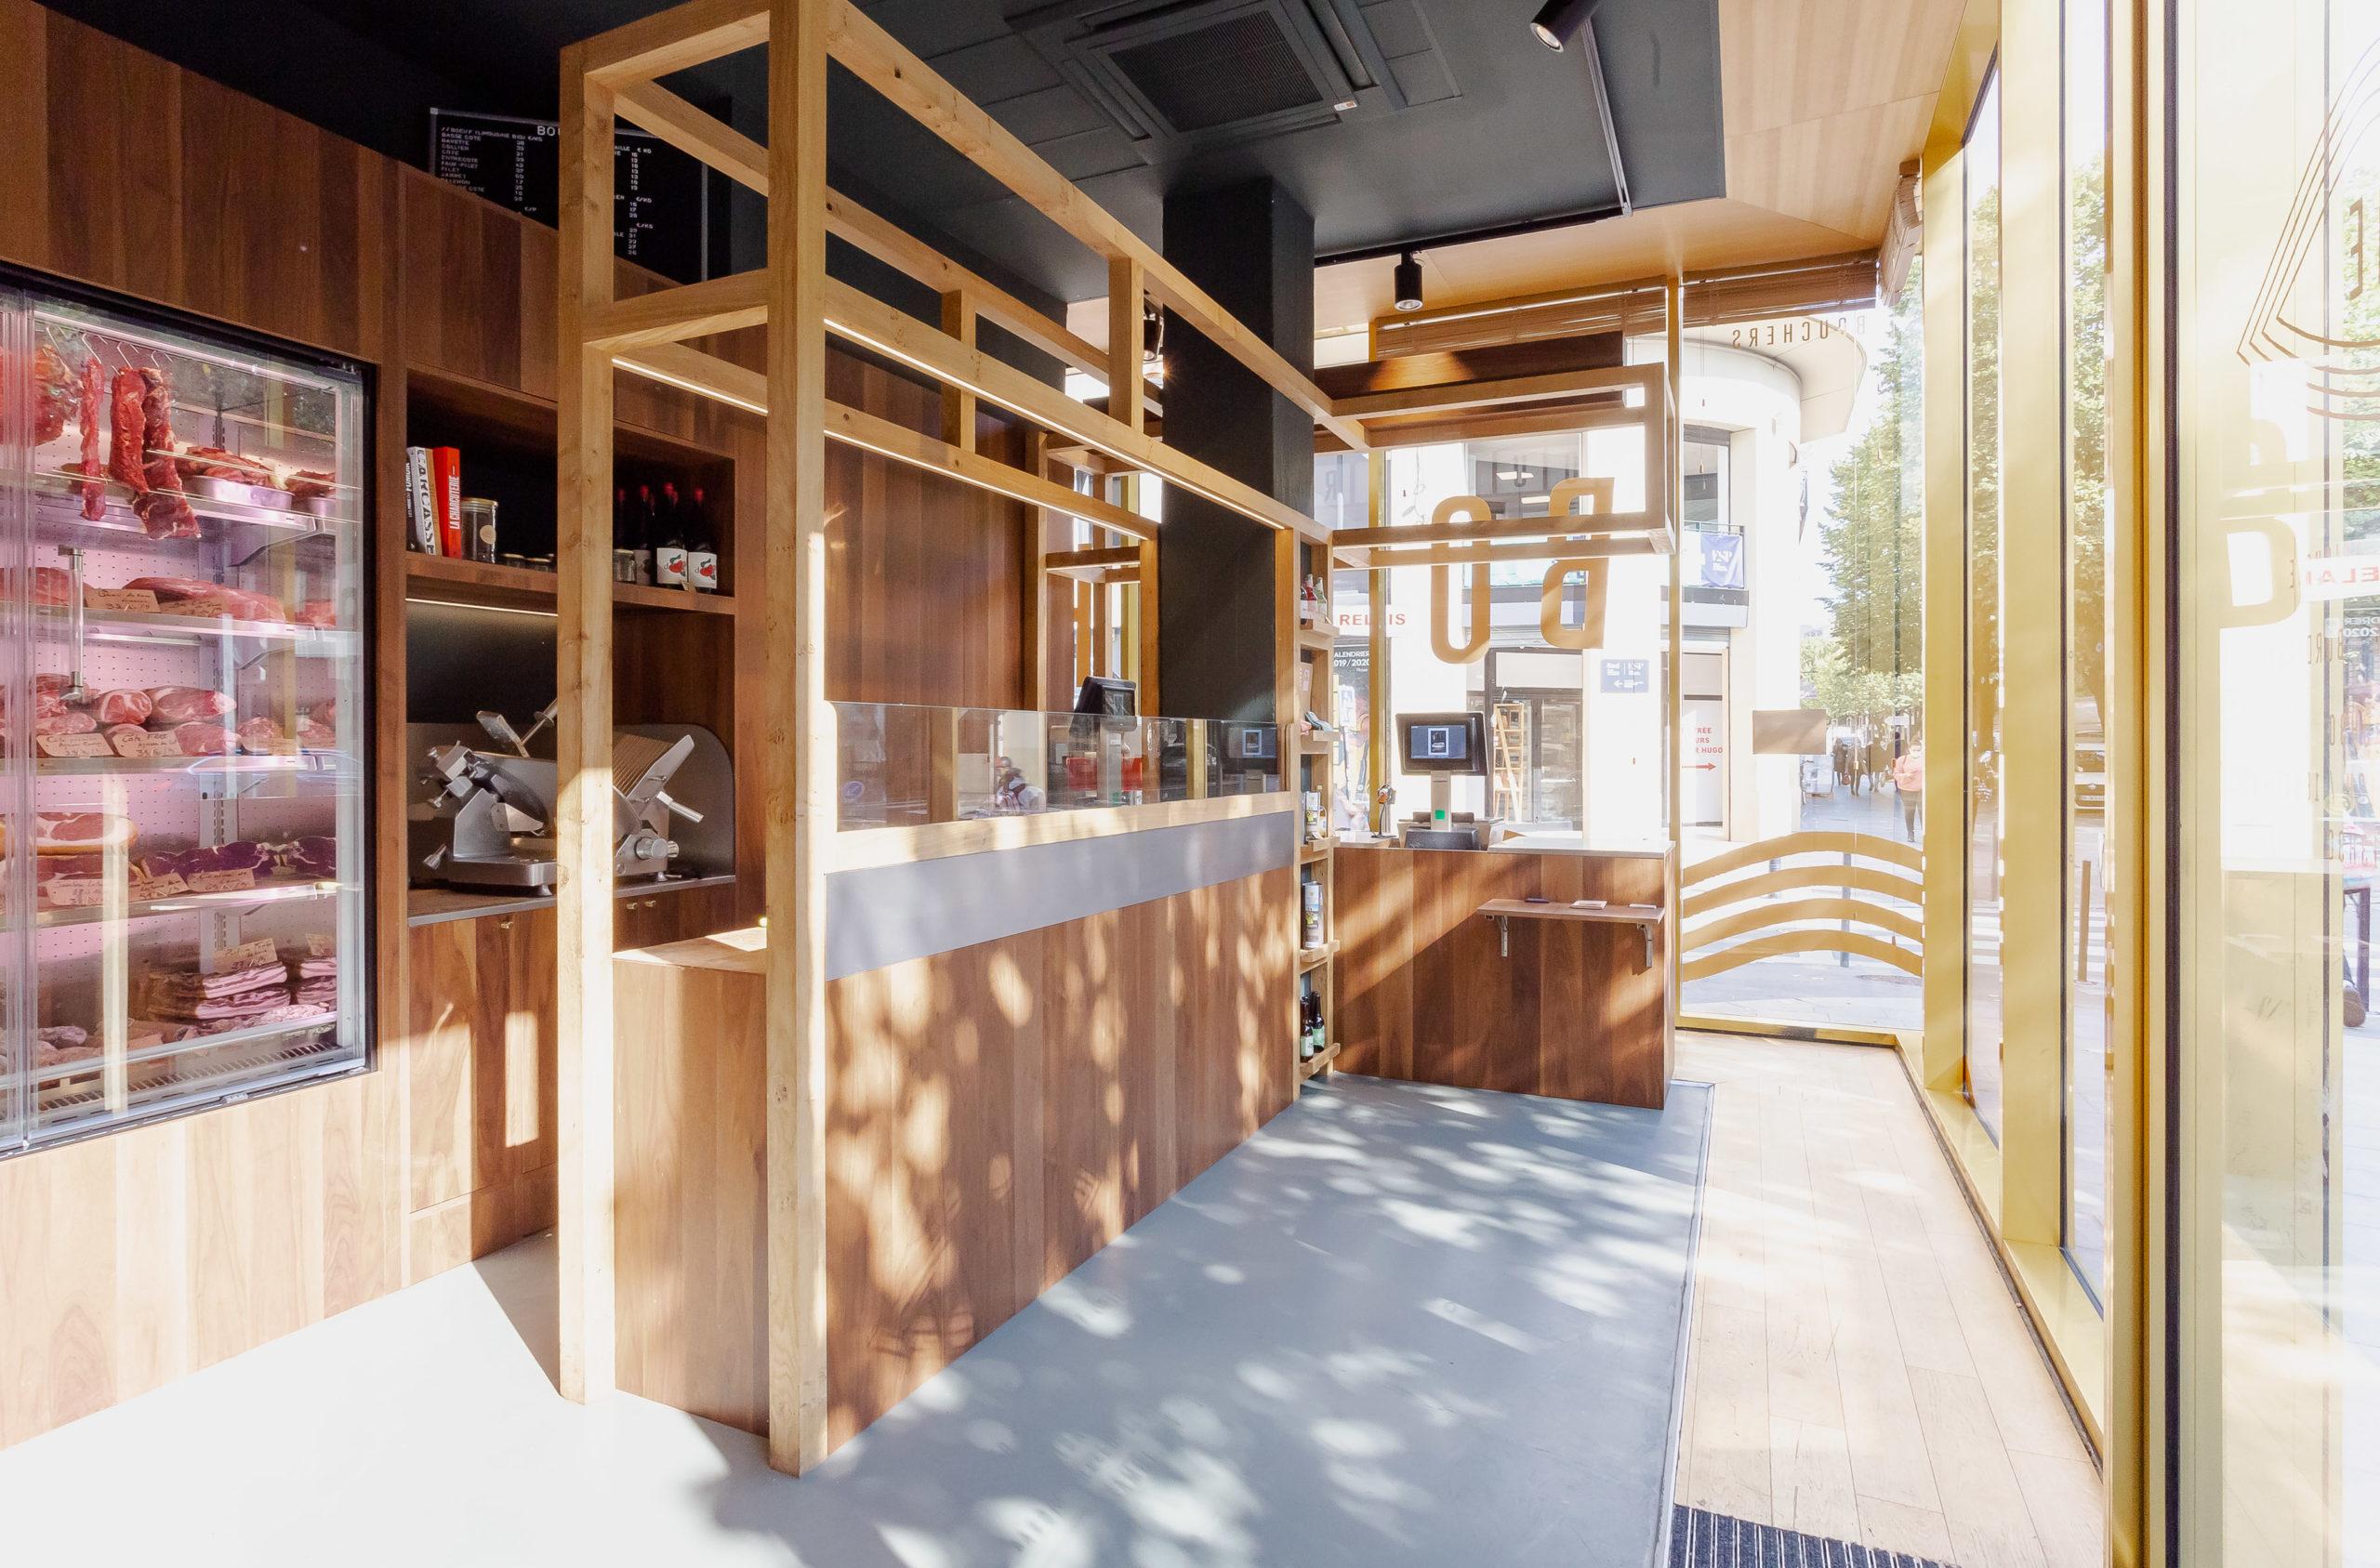 Bouche architecture_Thomas_Dircks _C-4